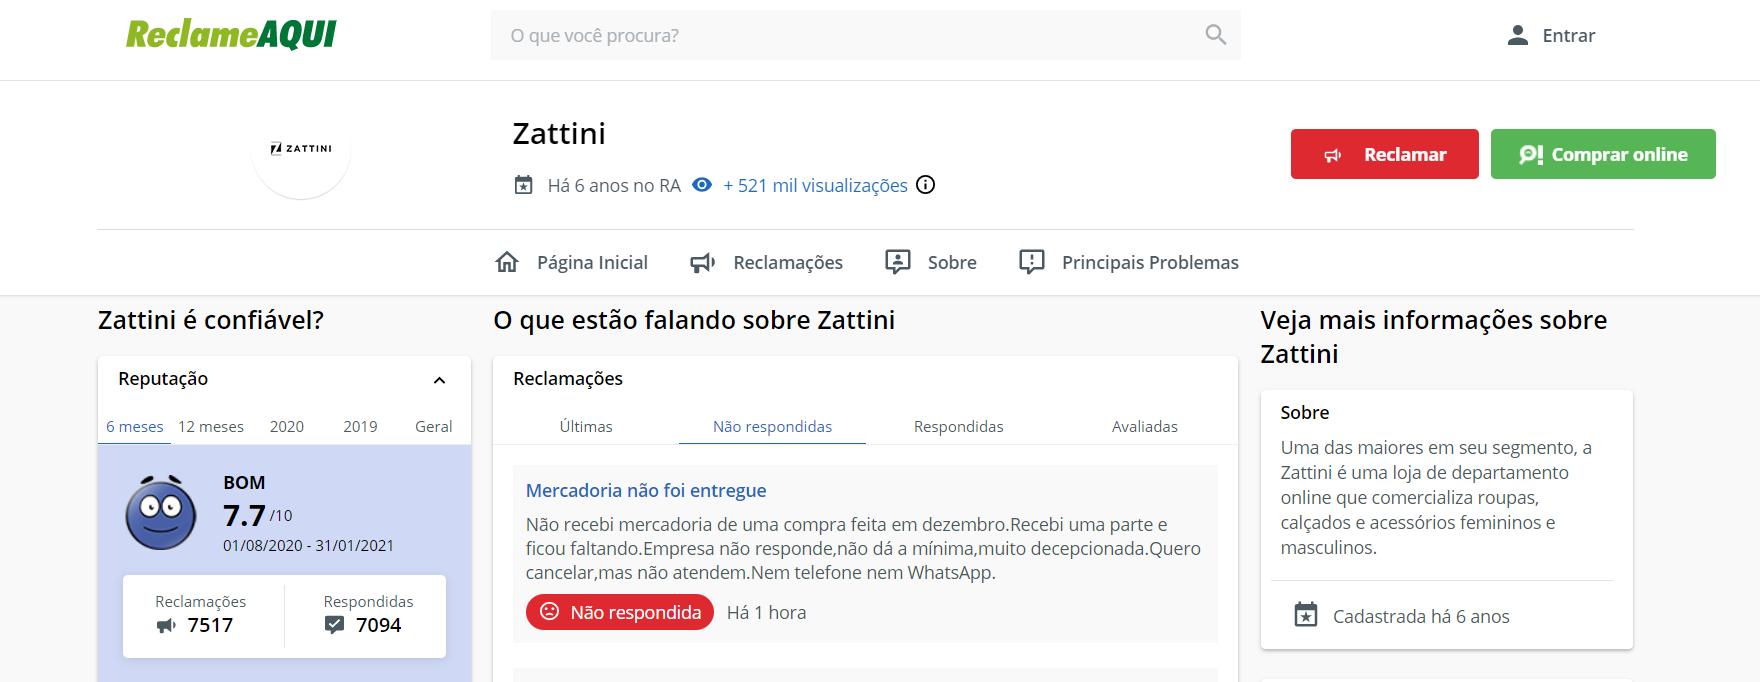 zattini reclame aqui